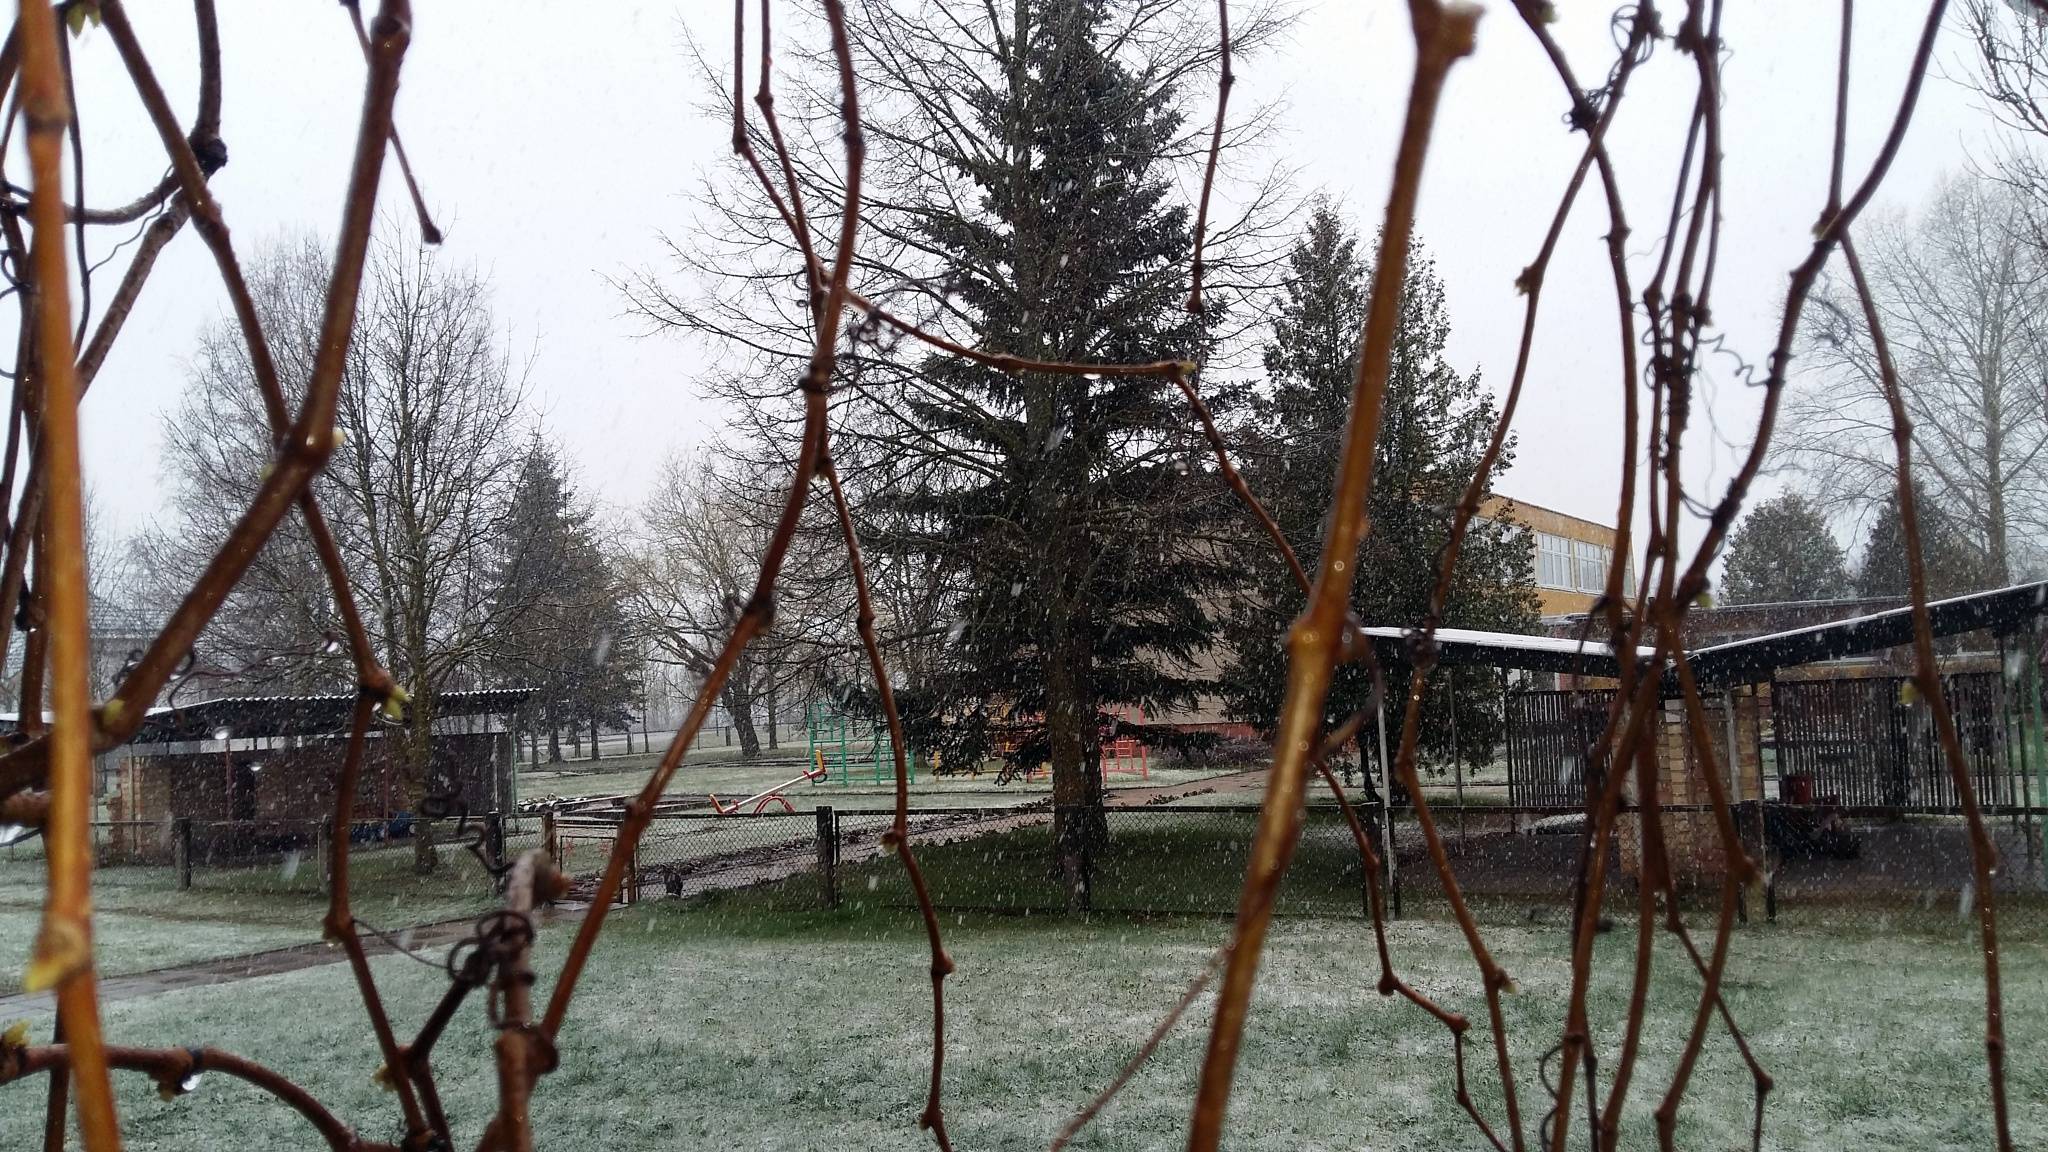 Early spring by uzkuraitiene62